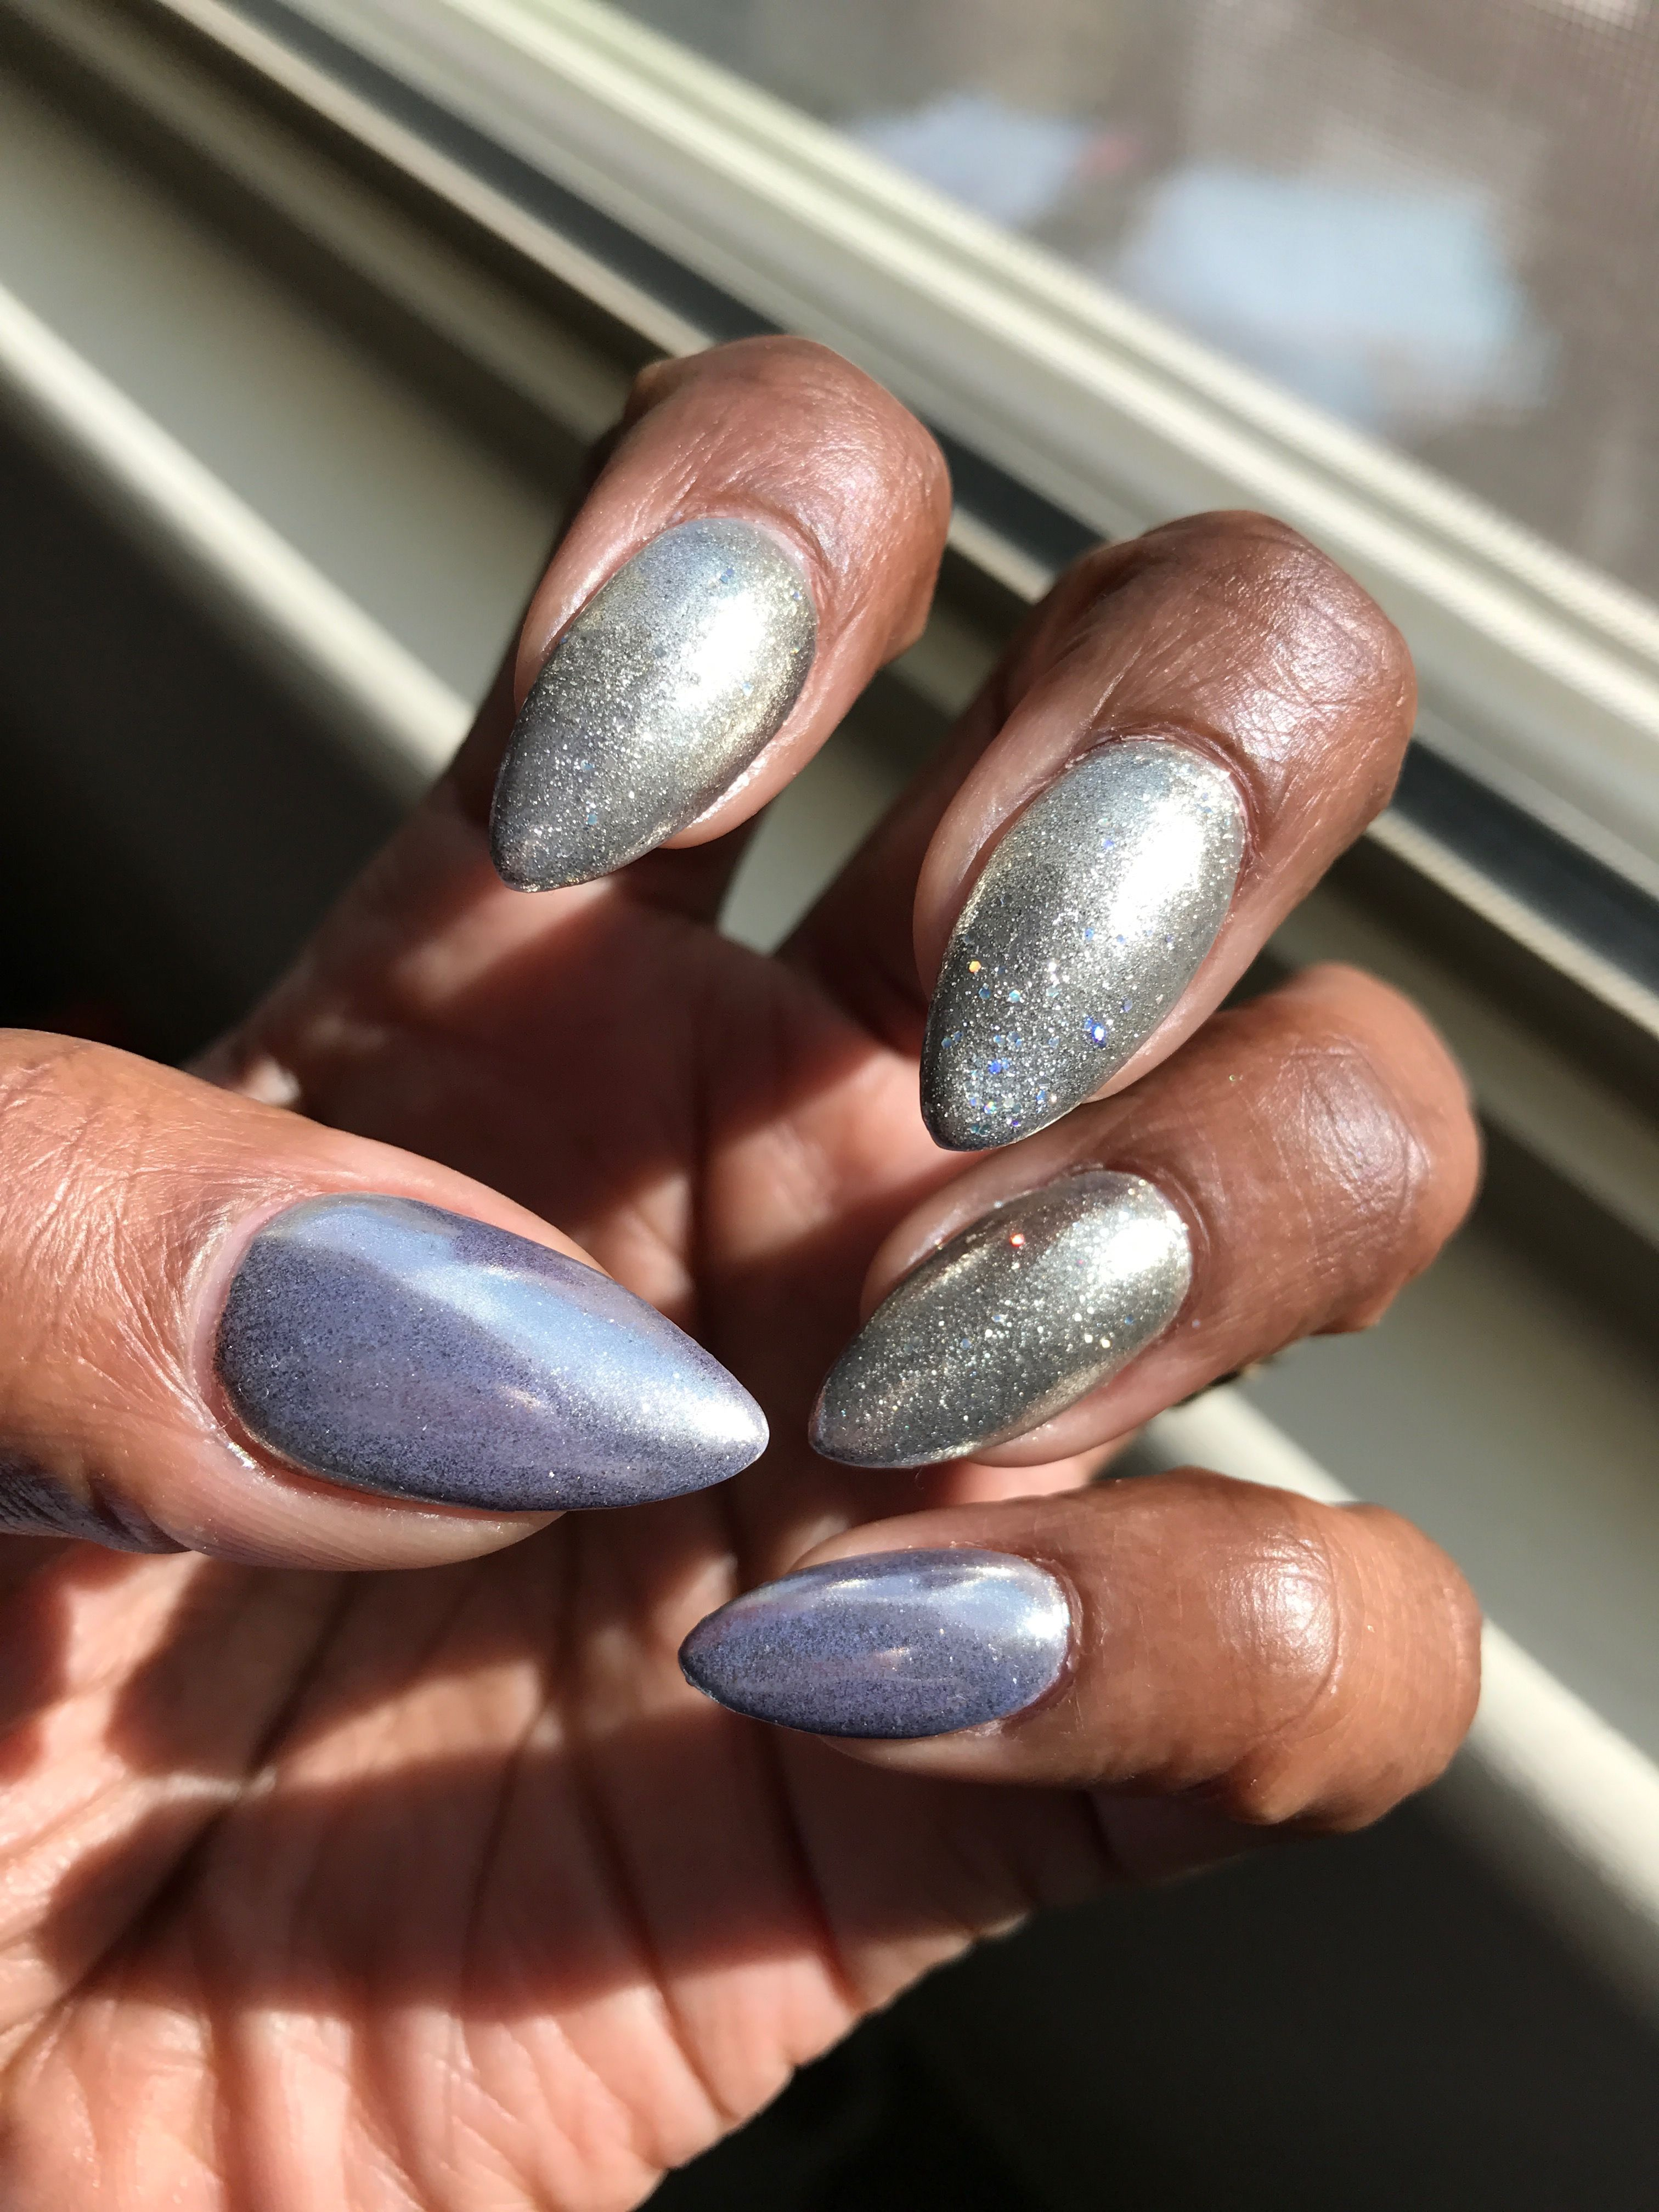 Super Cute Kiara Sky Dip Powder Overlay On My Natural Nails With Gelish Polish And Chrome Powder Gorgeous Natural Nails Dip Powder Nails How To Do Nails